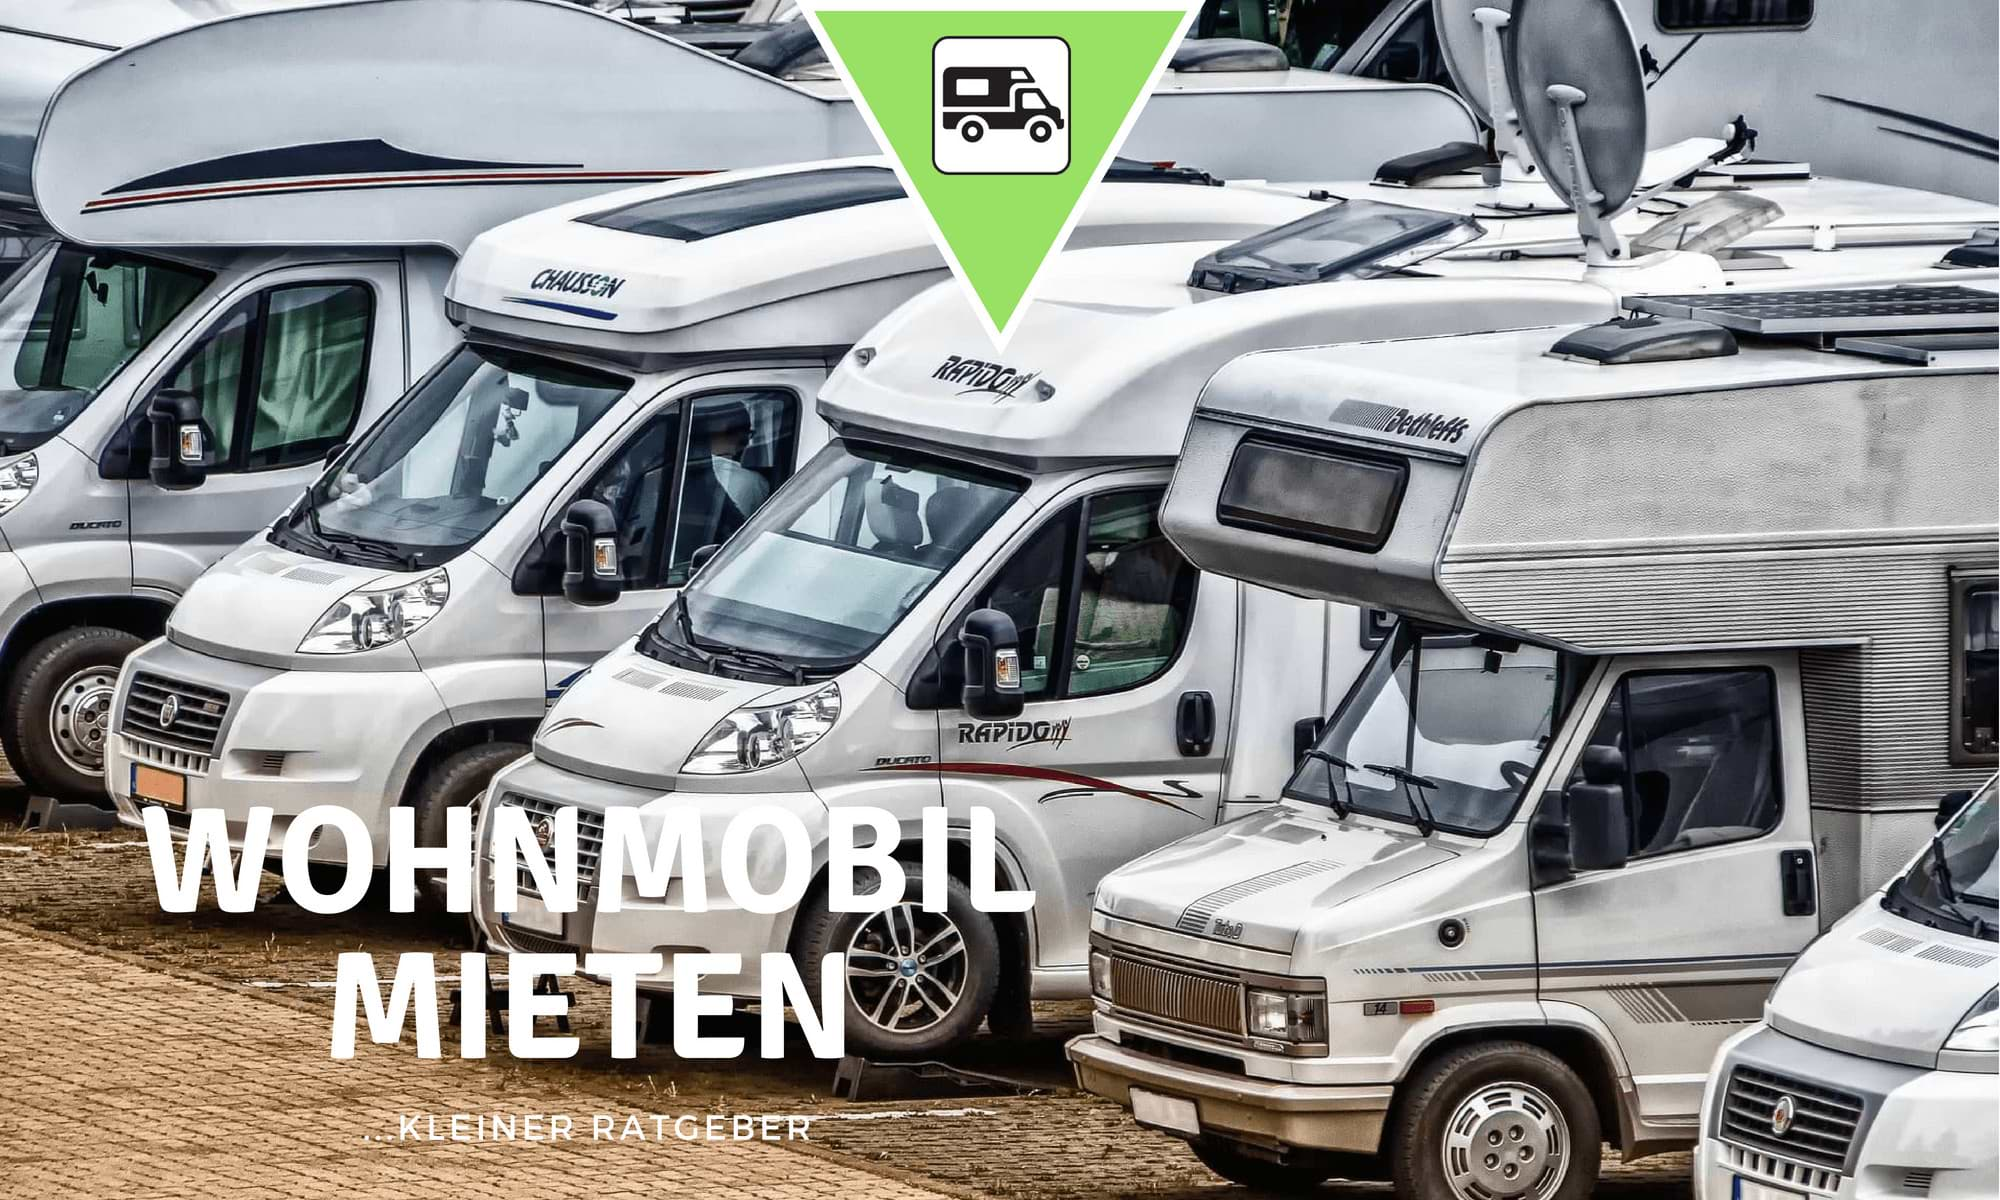 Wohnmobil mieten Ratgeber Camping